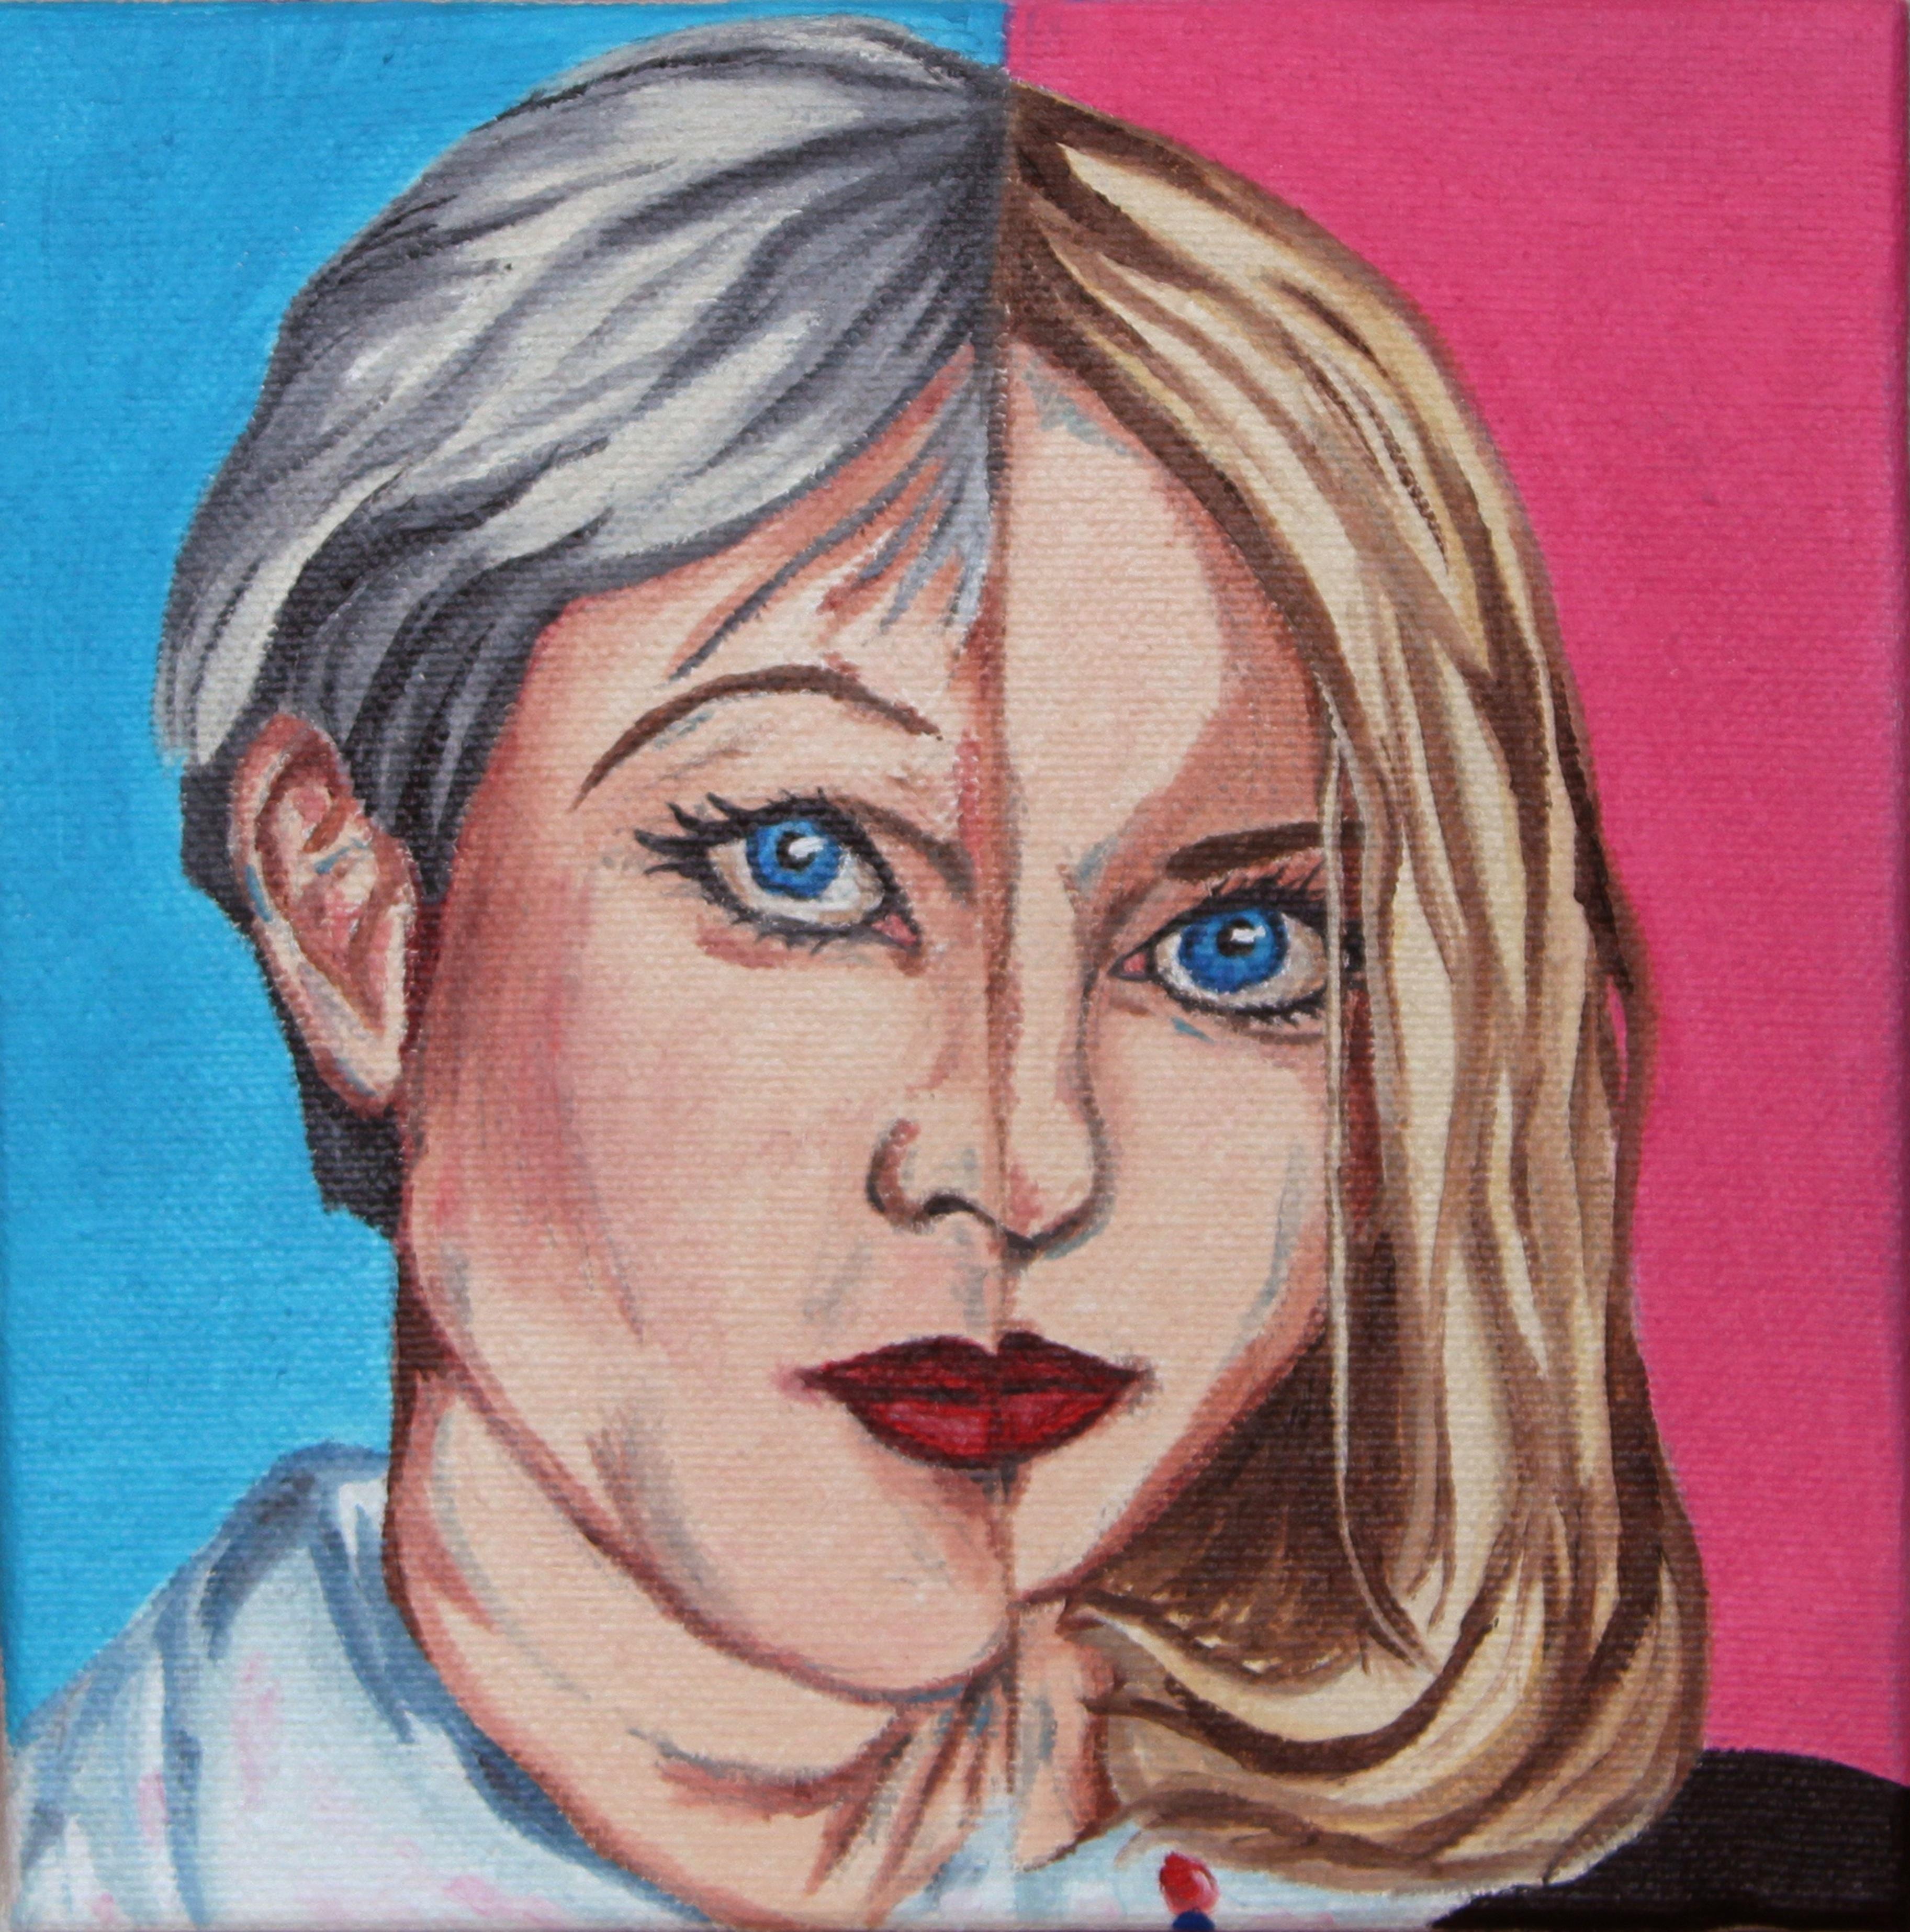 Andy Warhol + Me